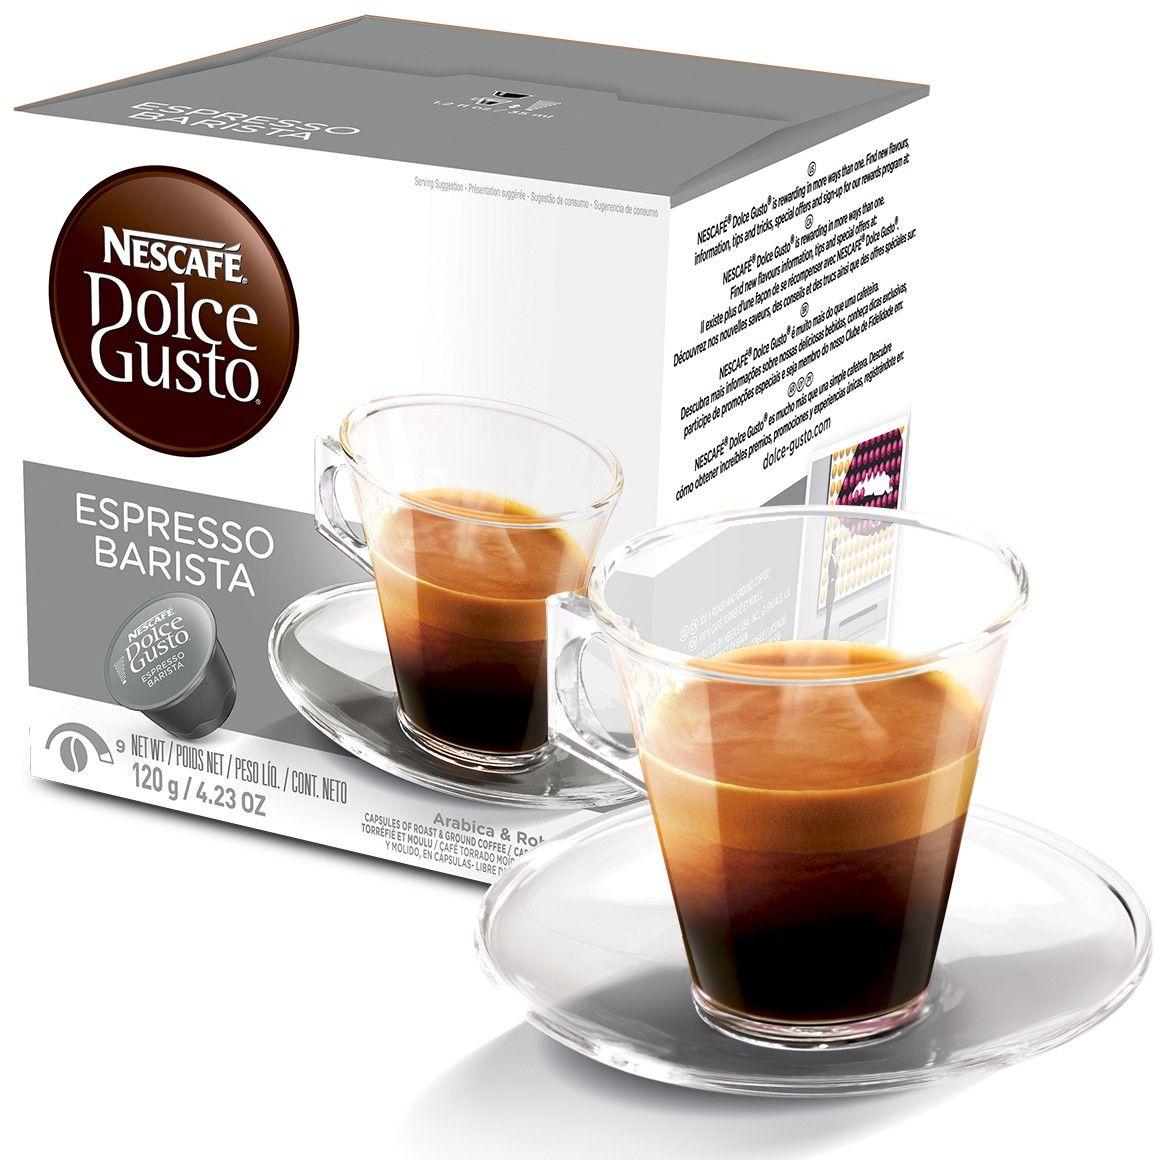 Cápsula Nescafé Dolce Gusto Expresso Barista 16 Cápsulas - Nestlé